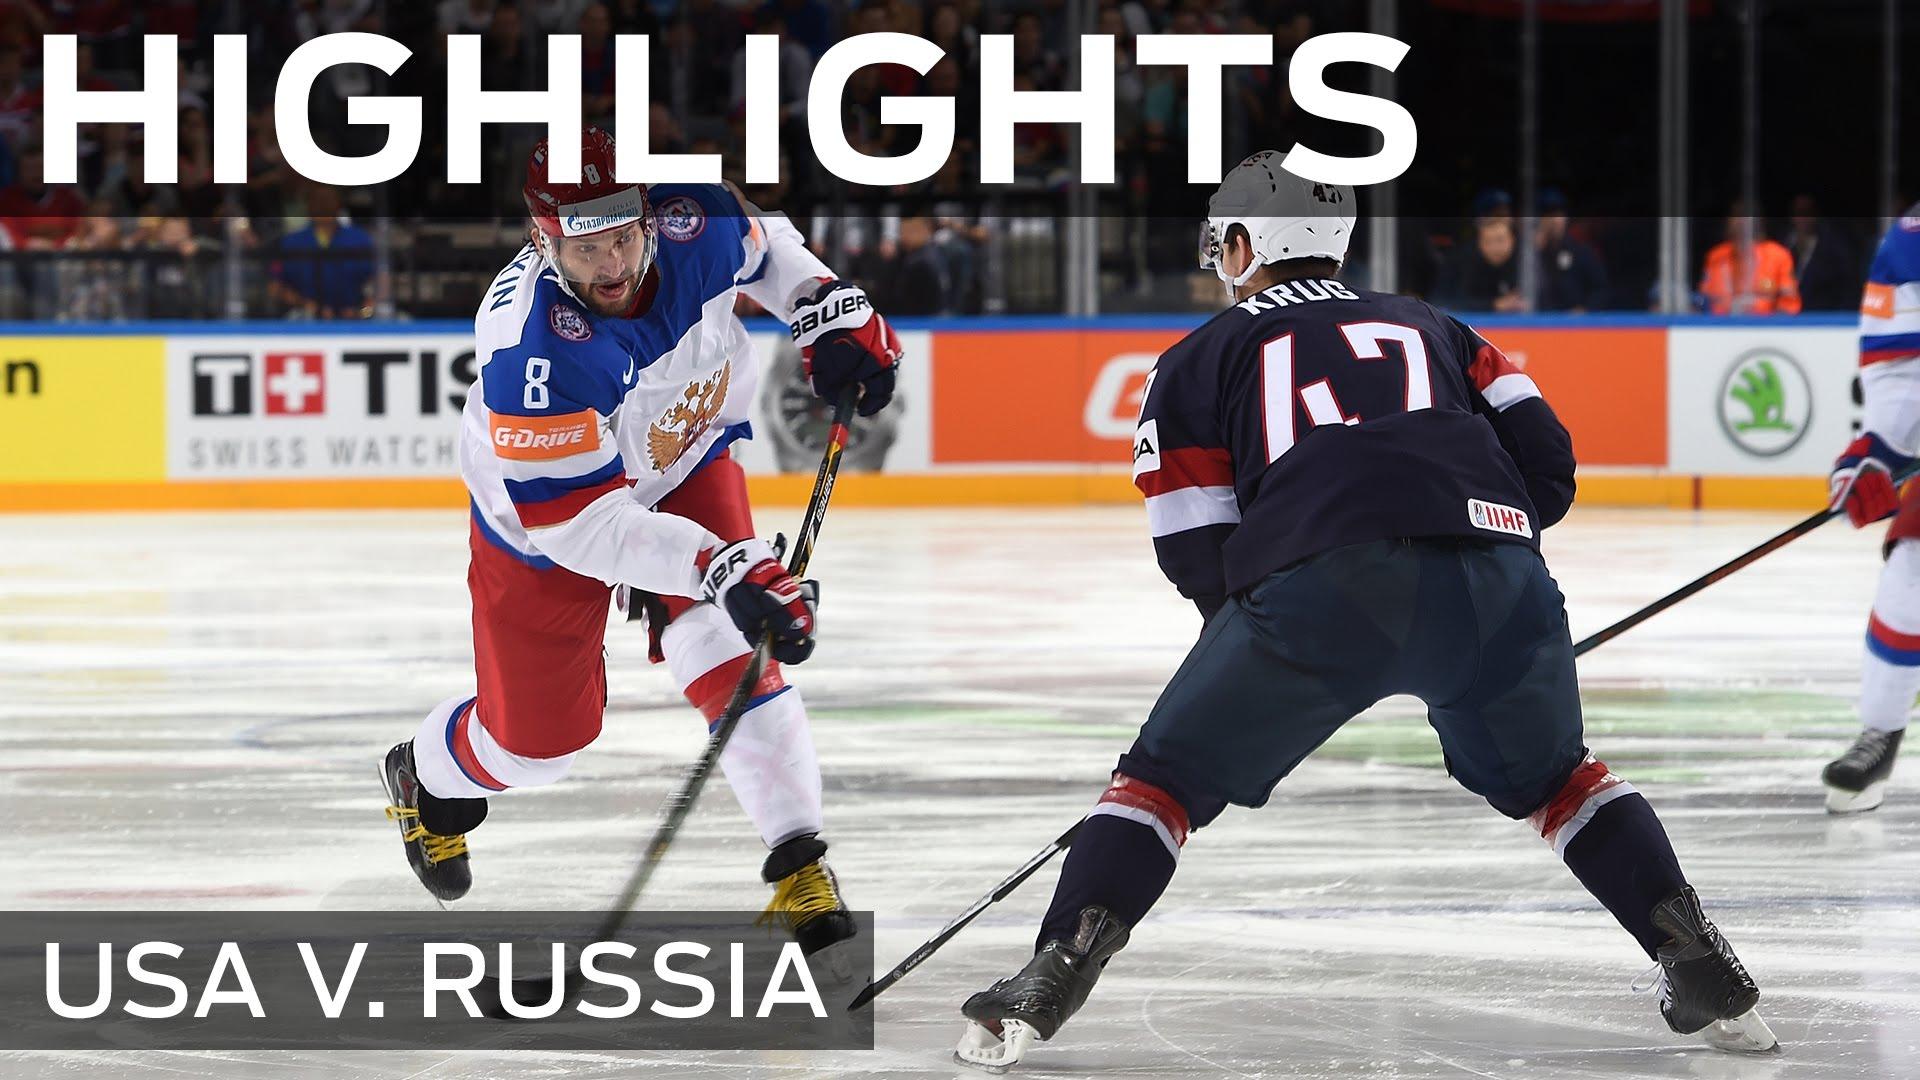 Russia roll past USA | #IIHFWorlds 2015